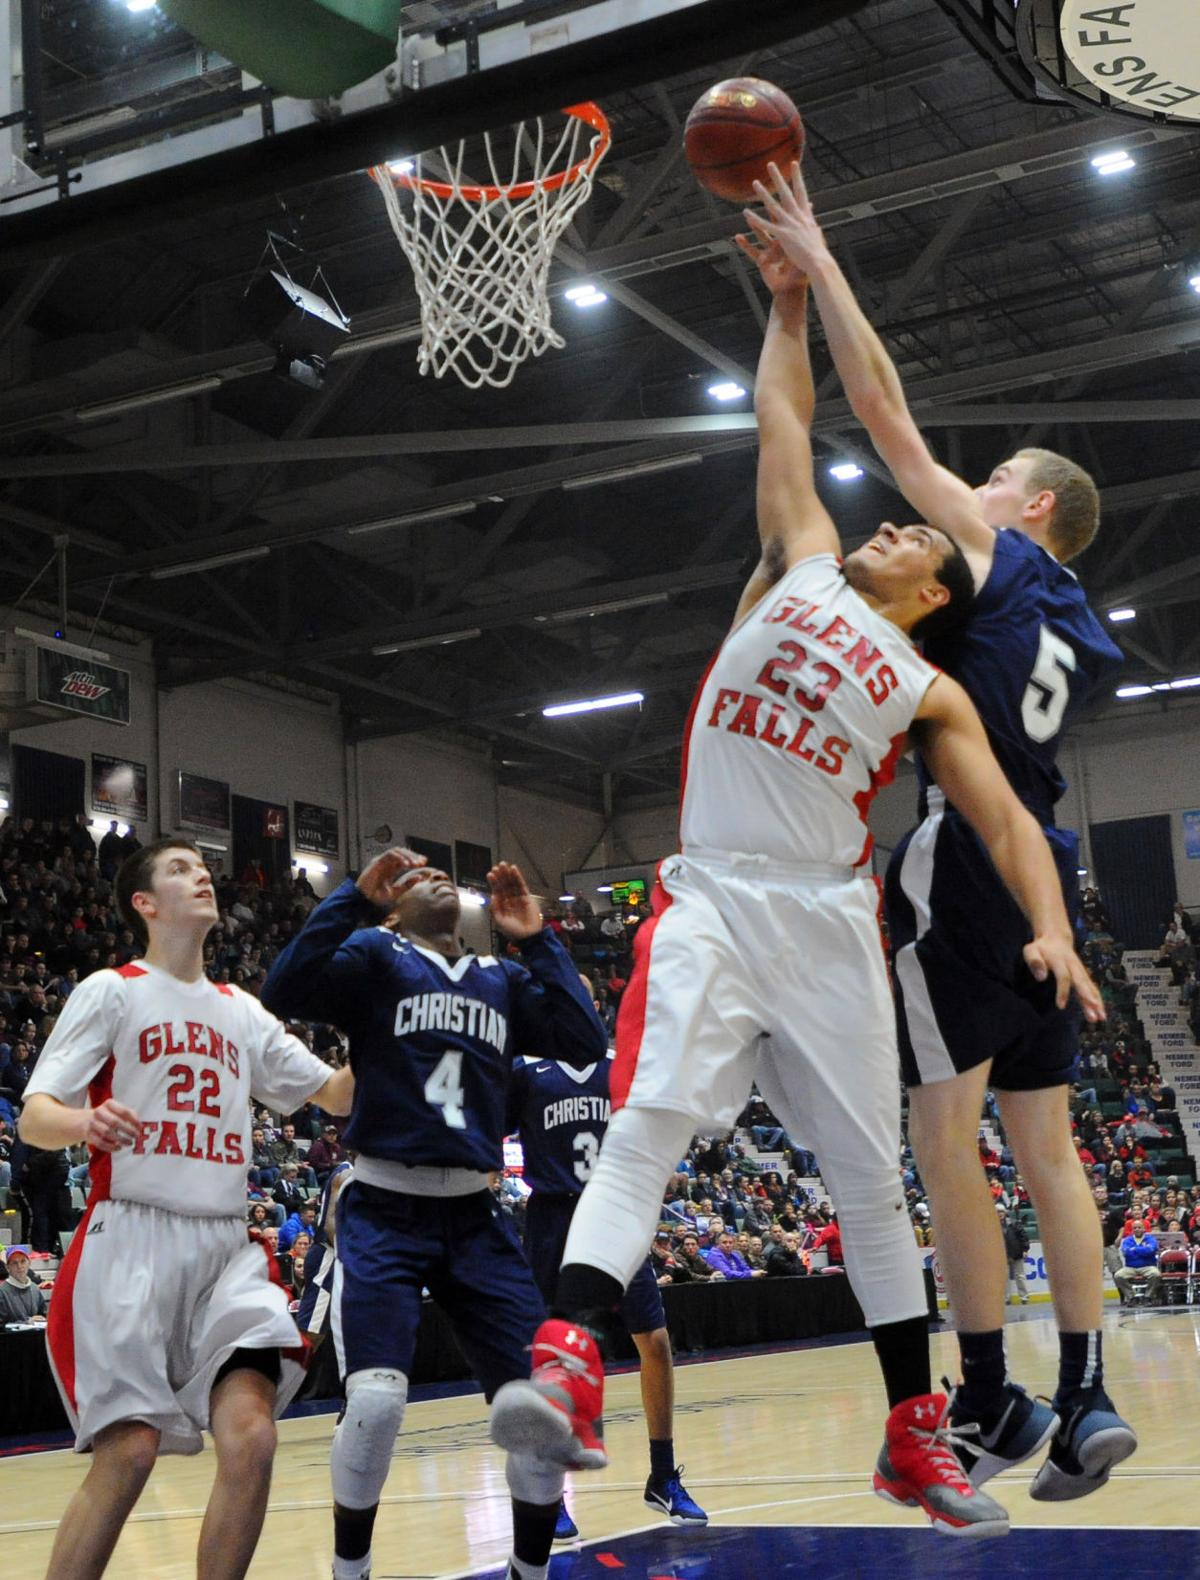 Boys Basketball -- Glens Falls vs. Mekeel Christian (copy)